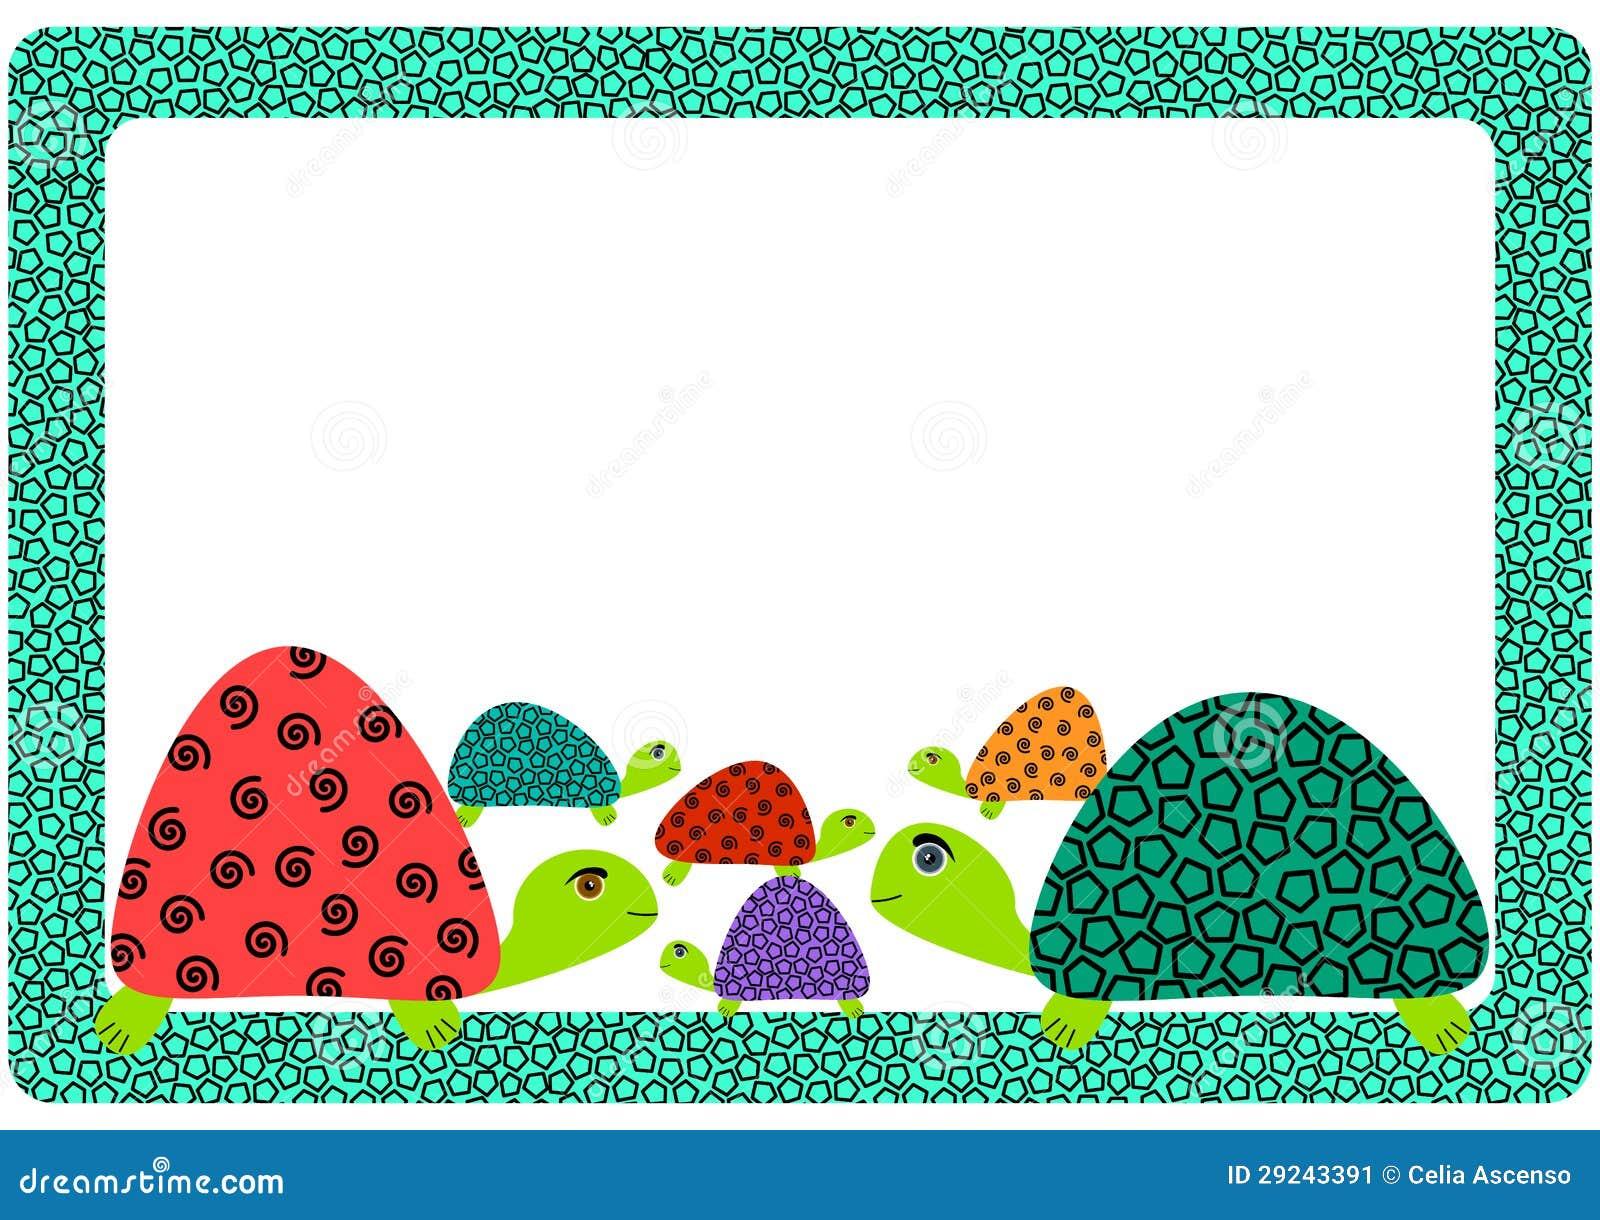 Turtle Family Frame Invitation Card Stock Image - Image ...